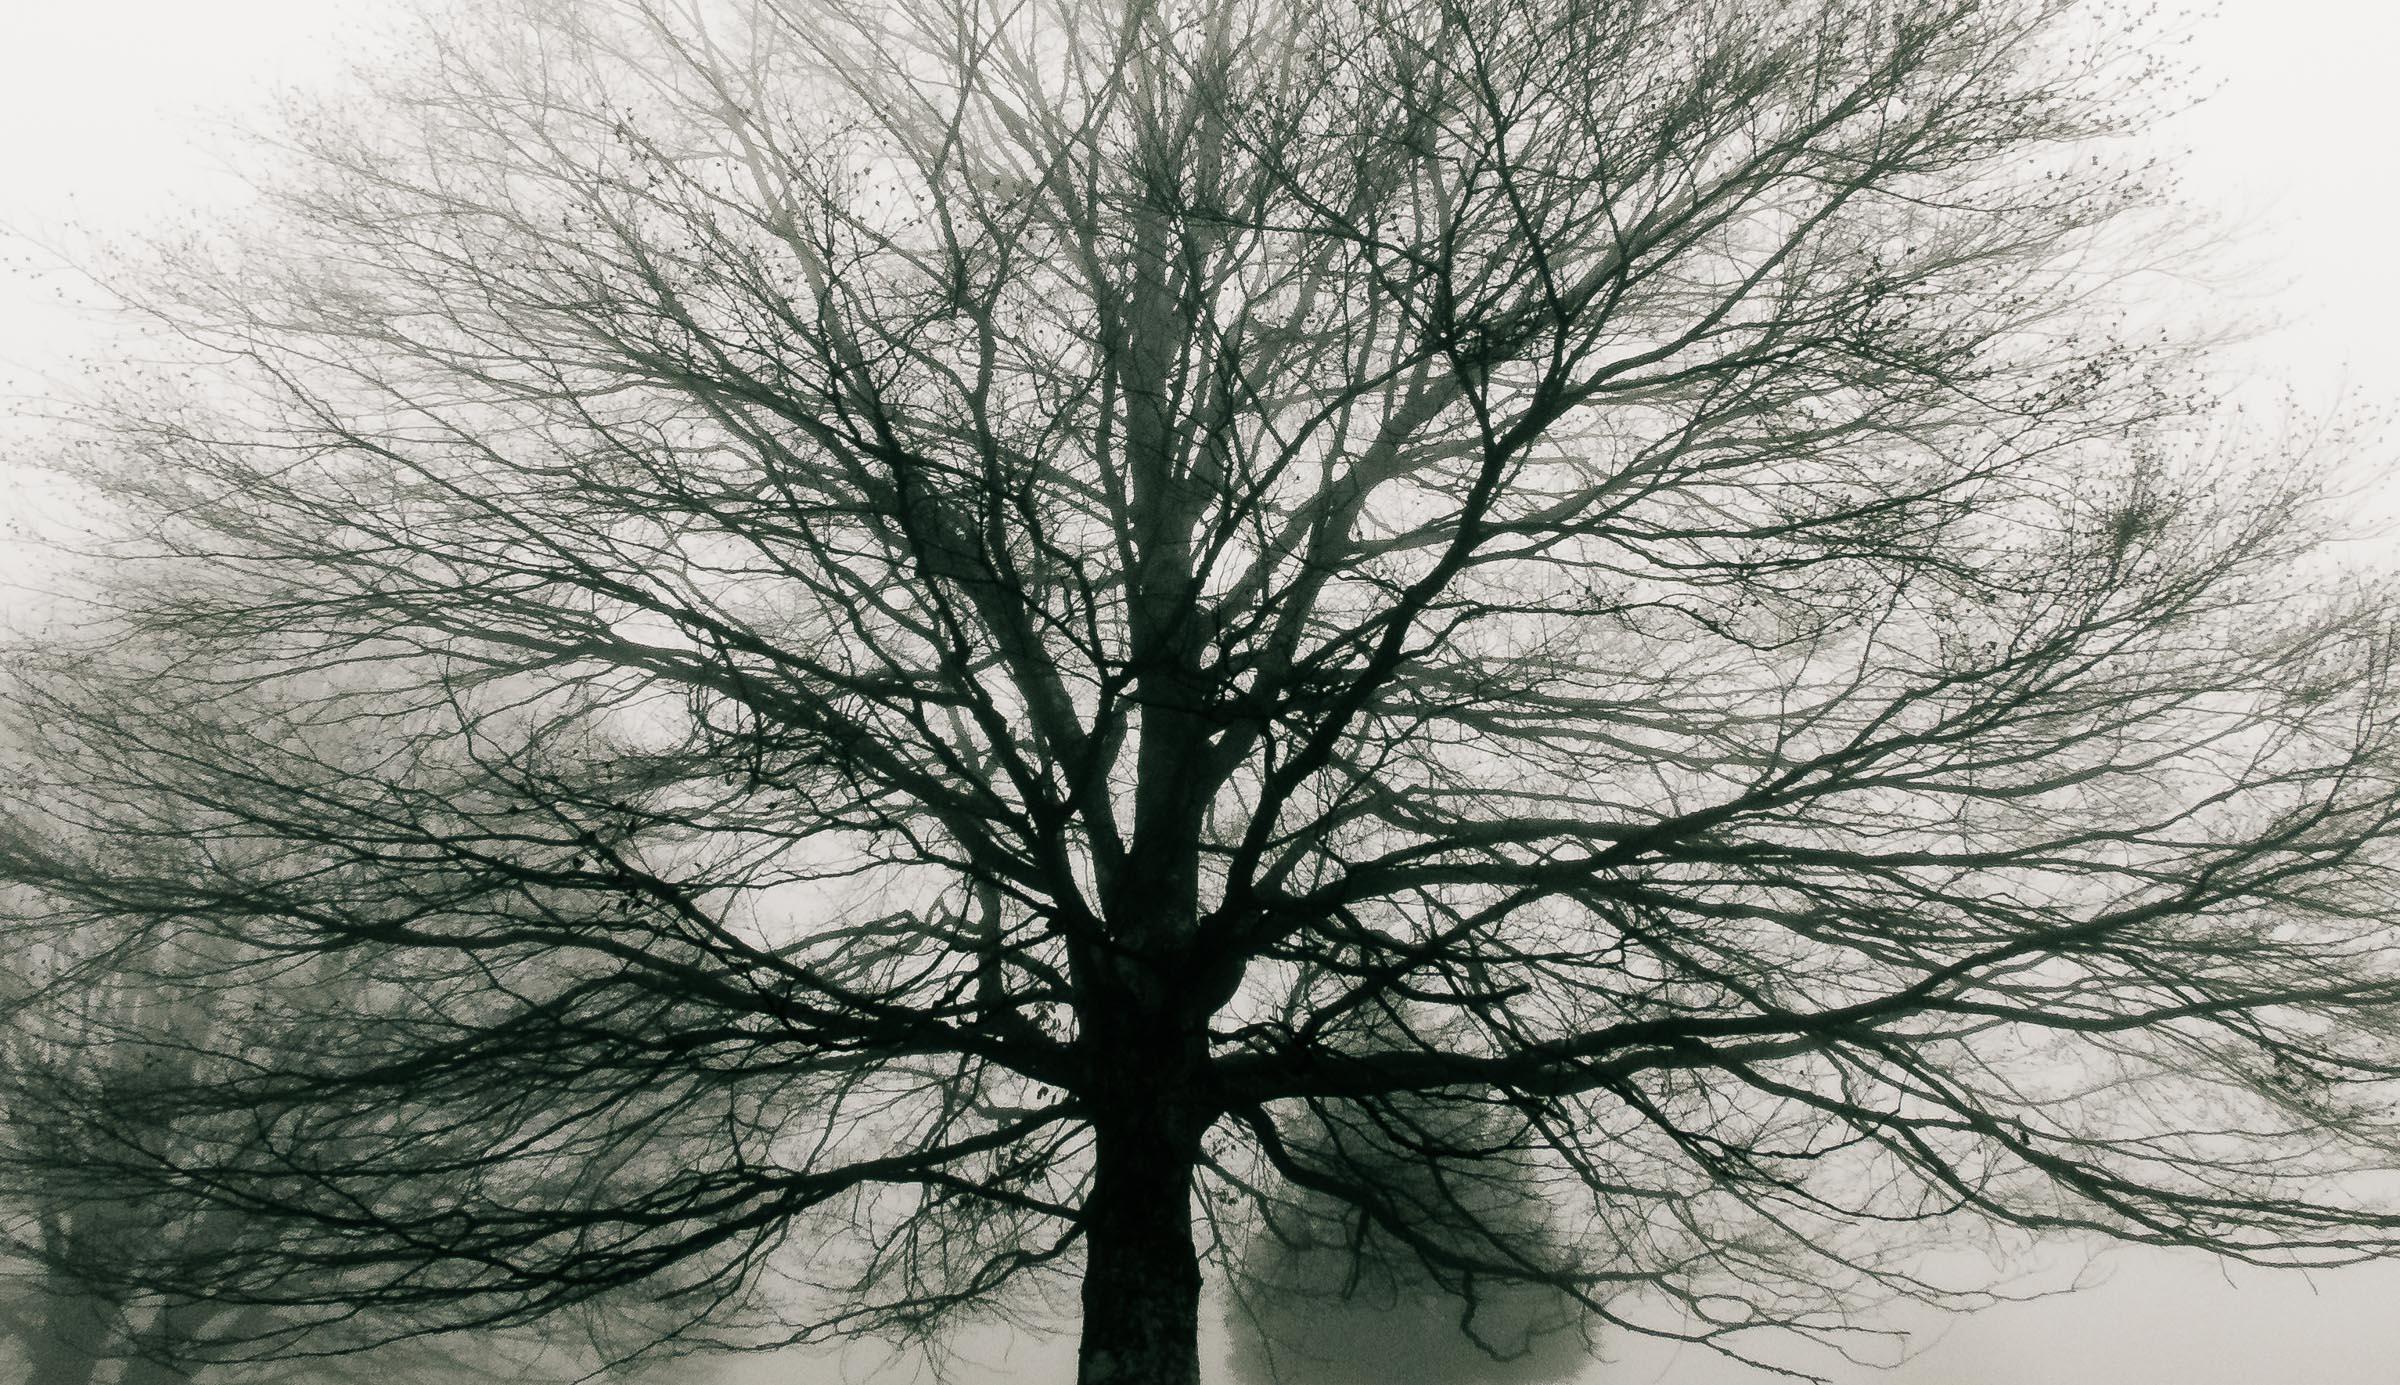 181216_Nebel_Wald_031-2